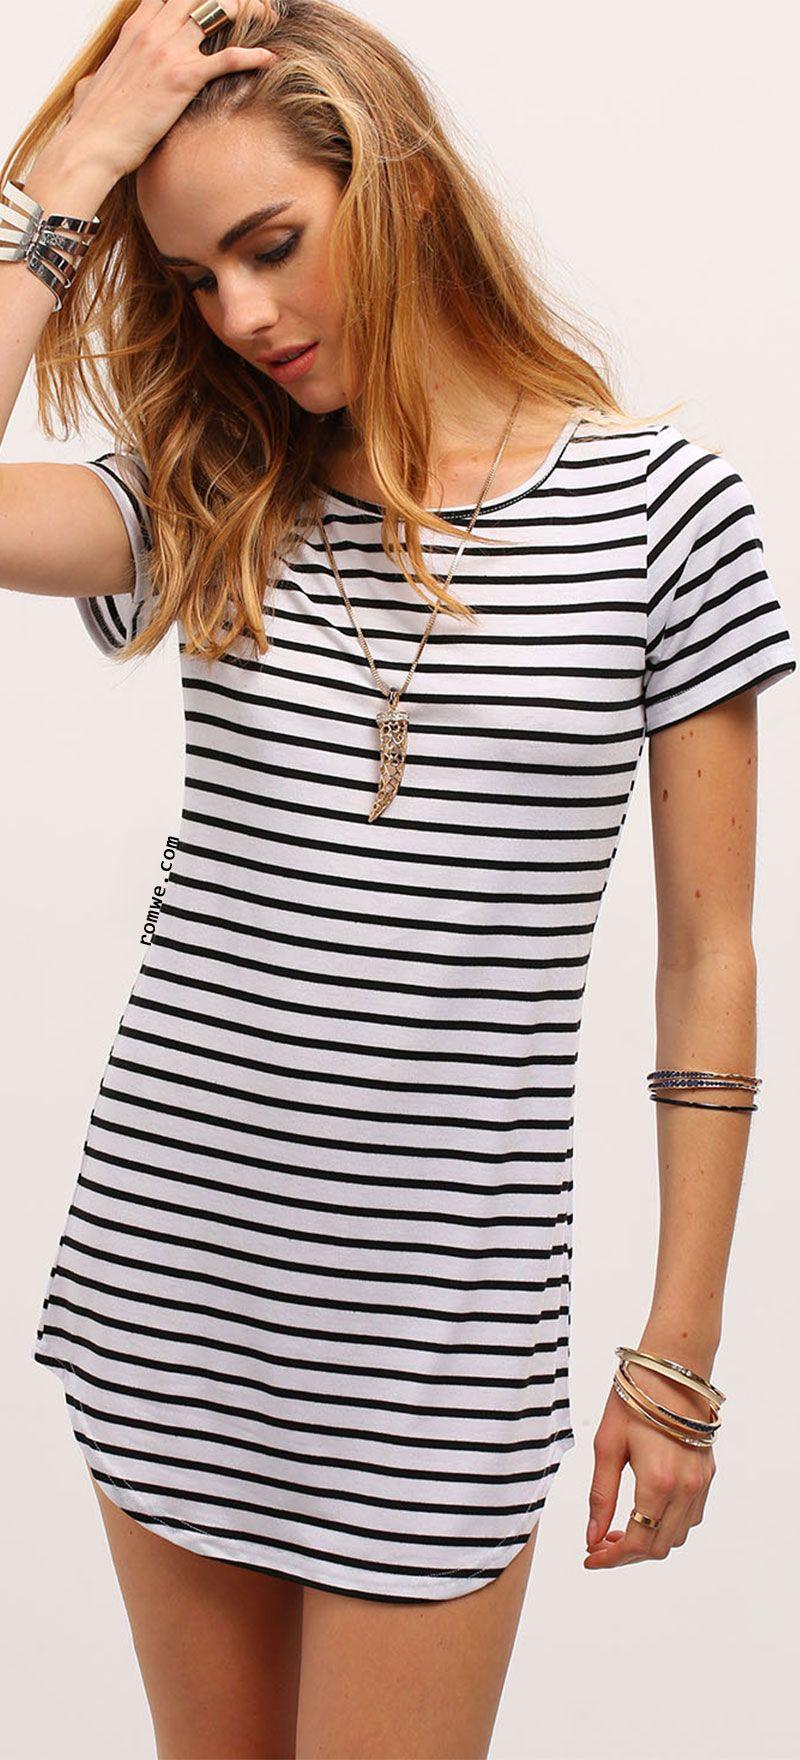 107ab020e522 ... Casual short Sleeve O-Neck Long Tees Tops. Black White Striped Curved  Hem T-shirt Dress